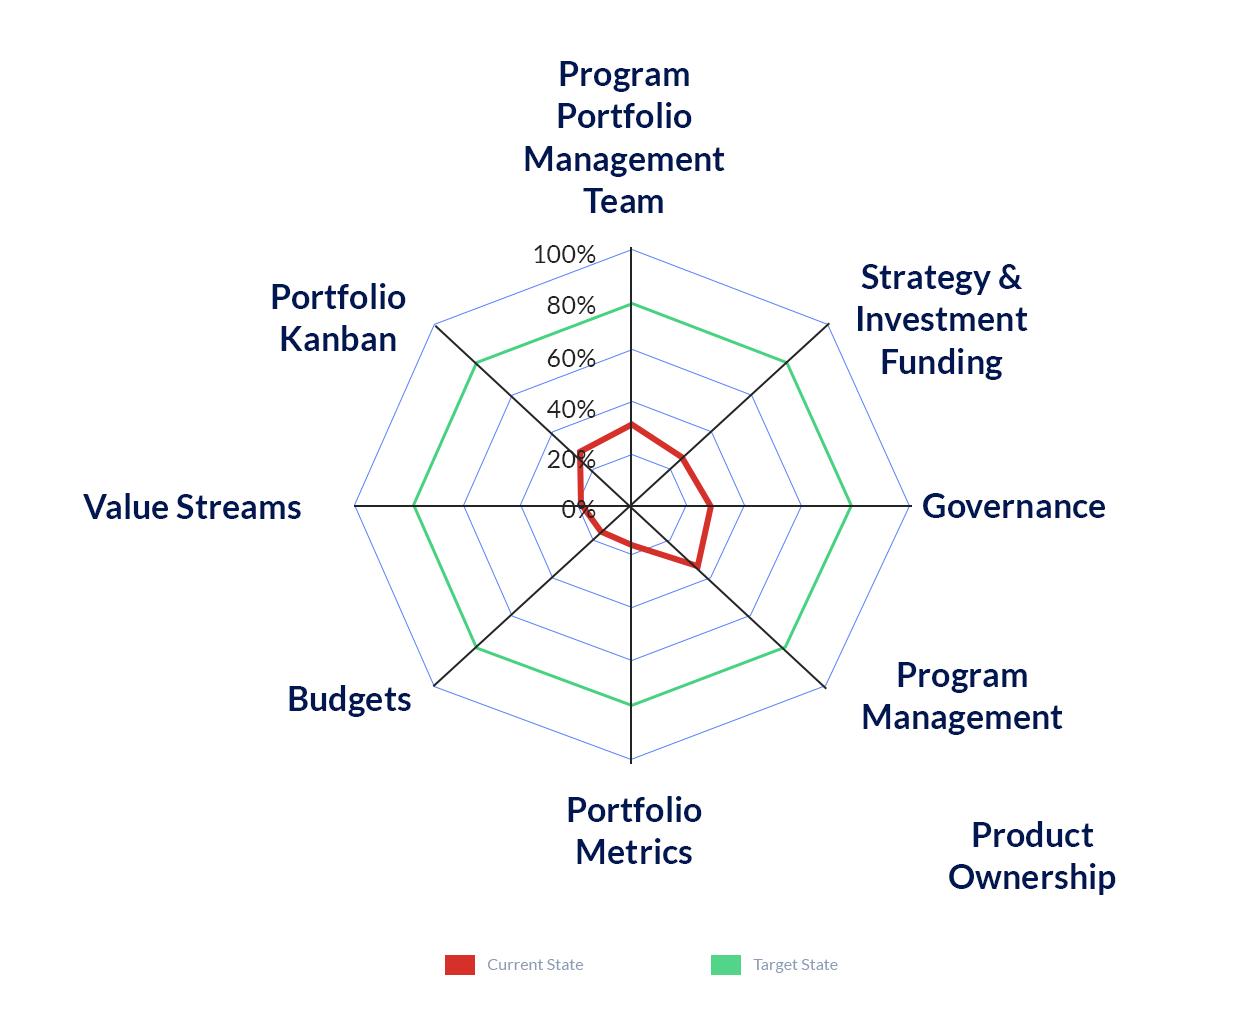 portfolio-program-team